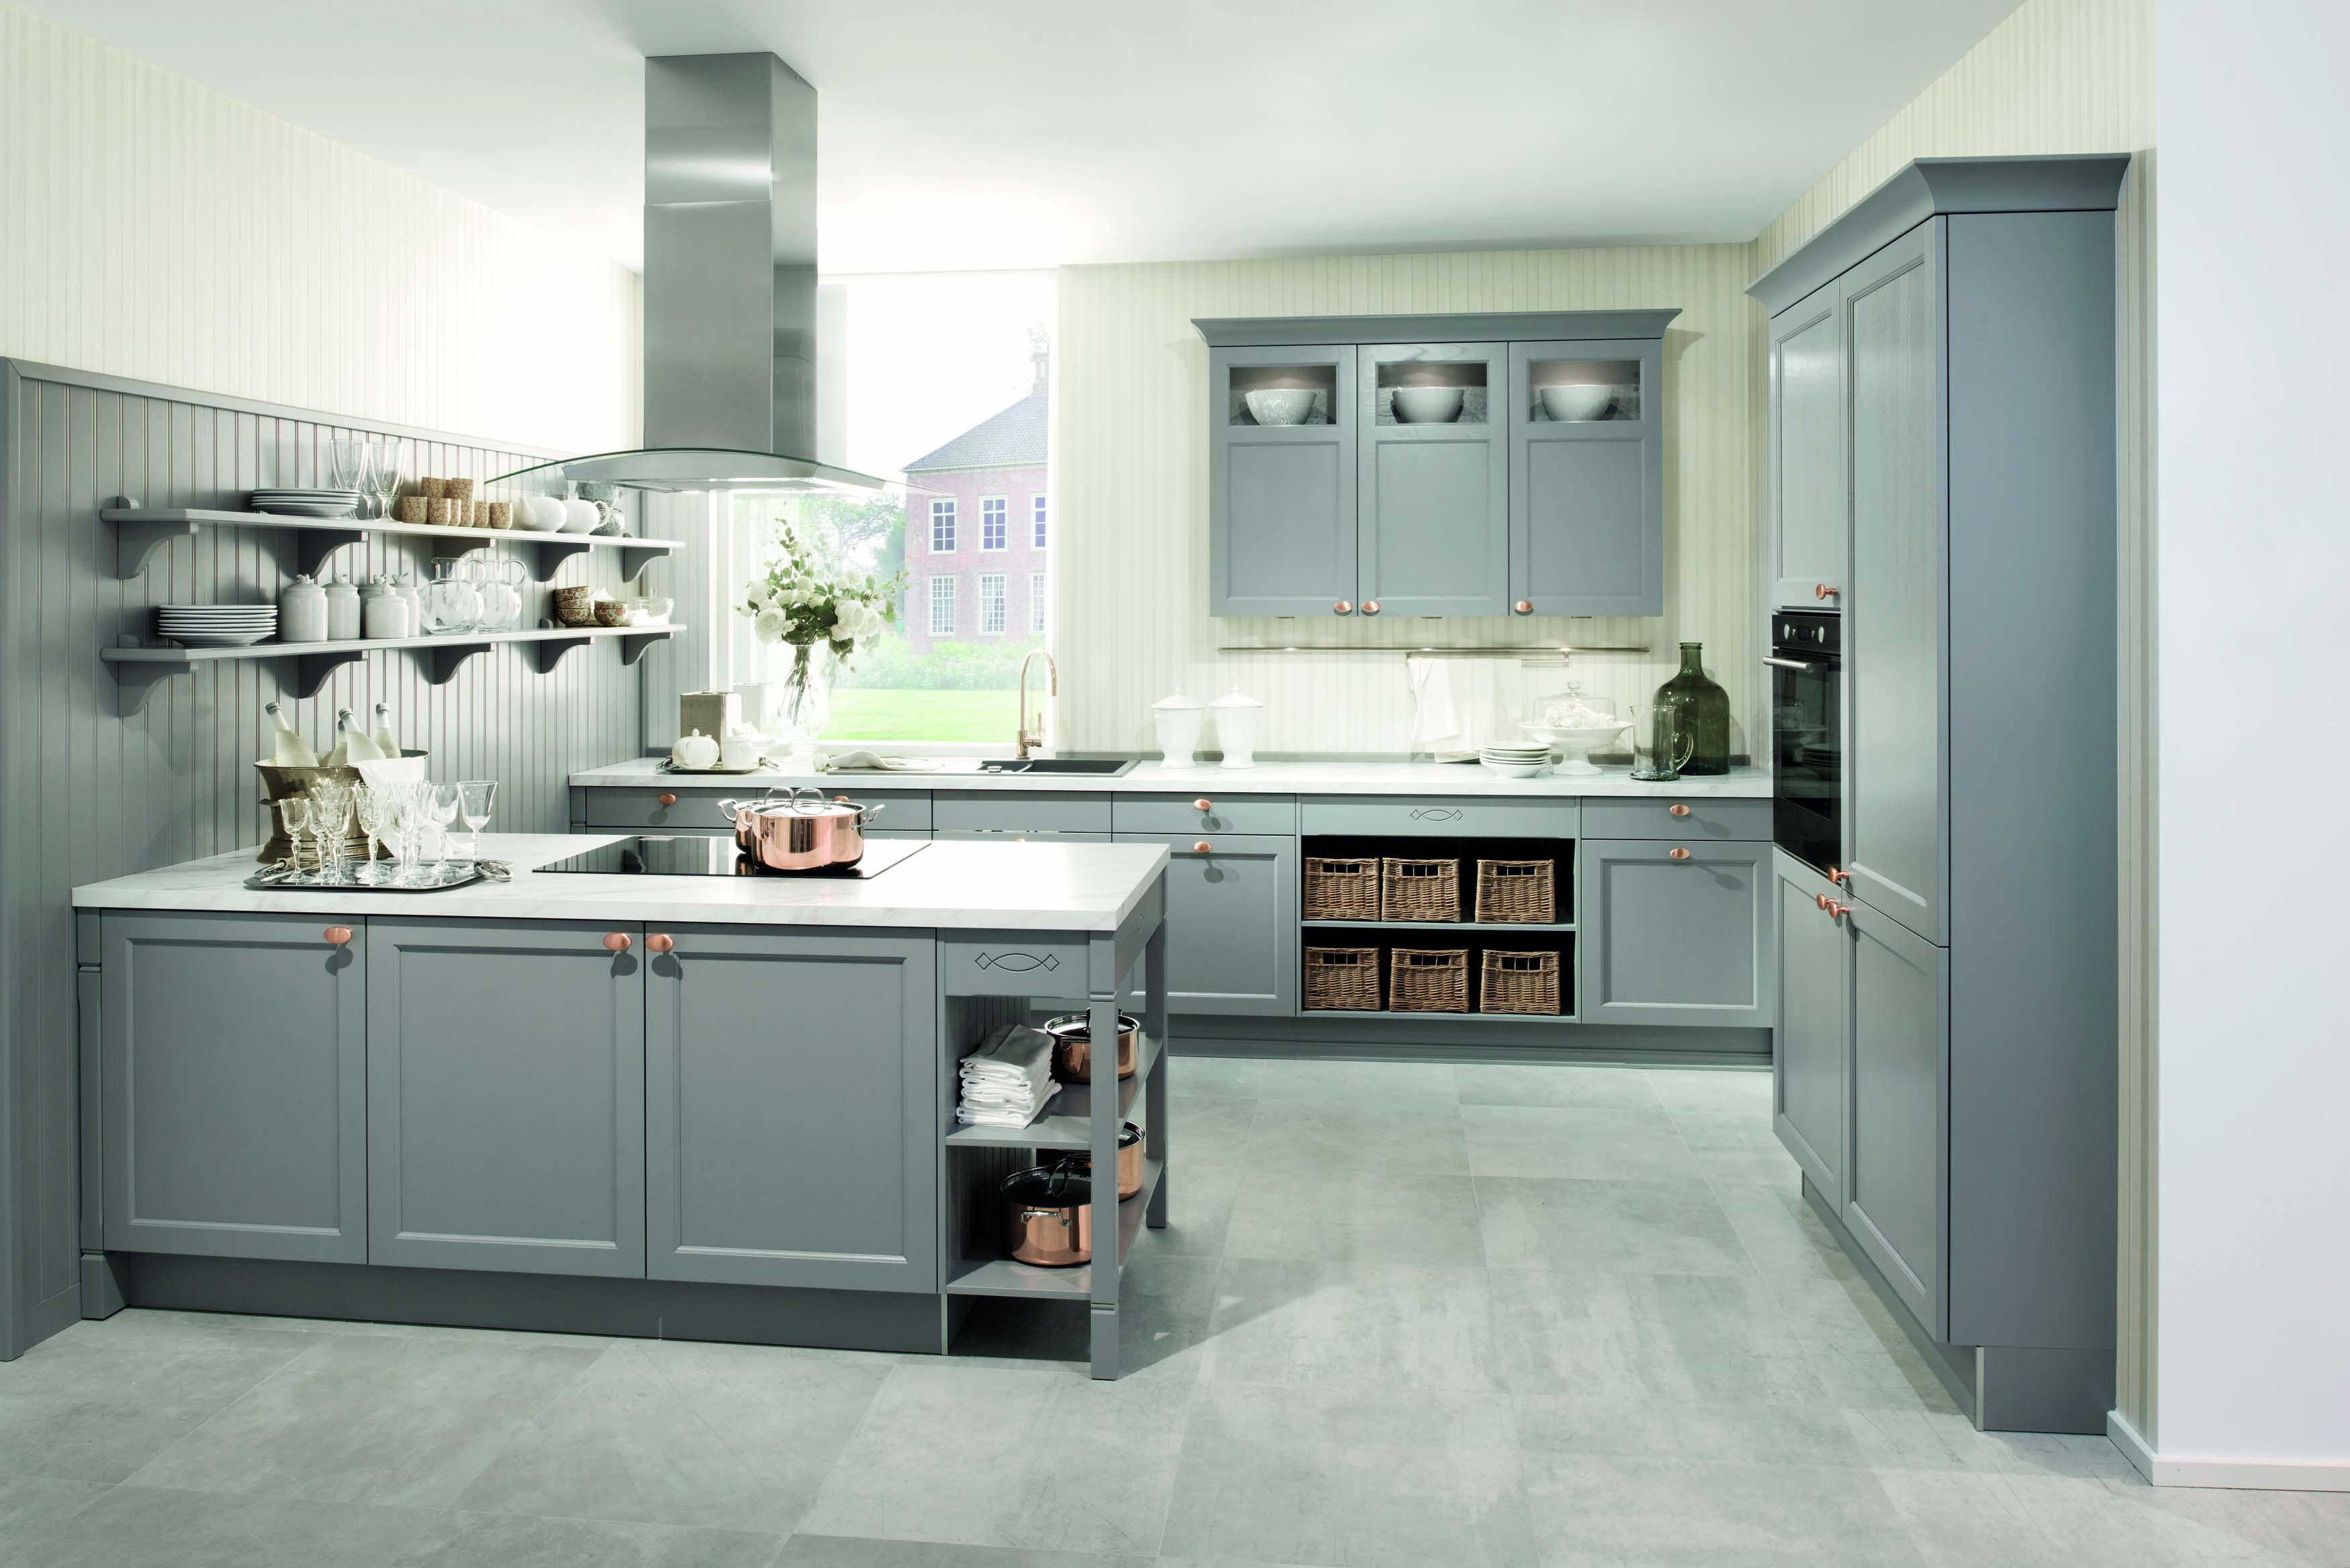 Colorful German Kitchen Worktops Image - Kitchen Cabinets | Ideas ...